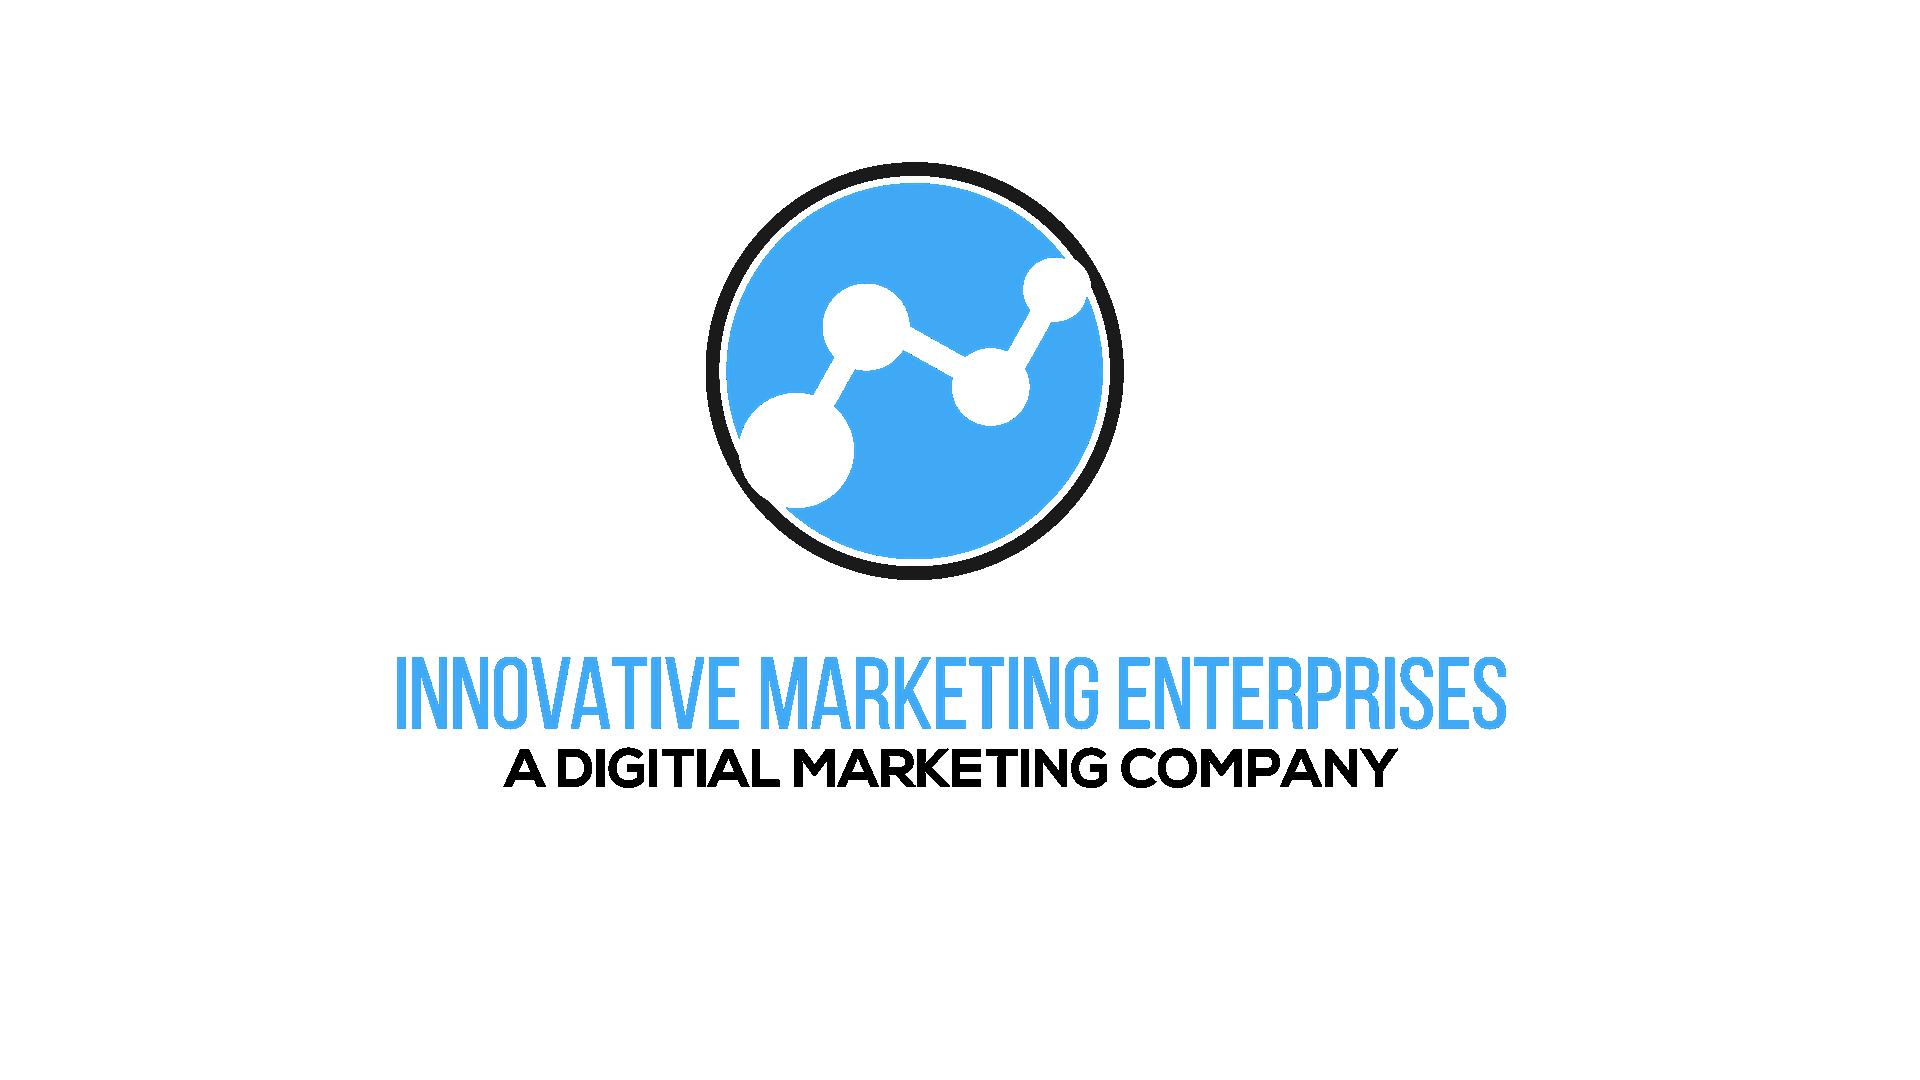 Innovative Marketing Enterprises Inc. image 1